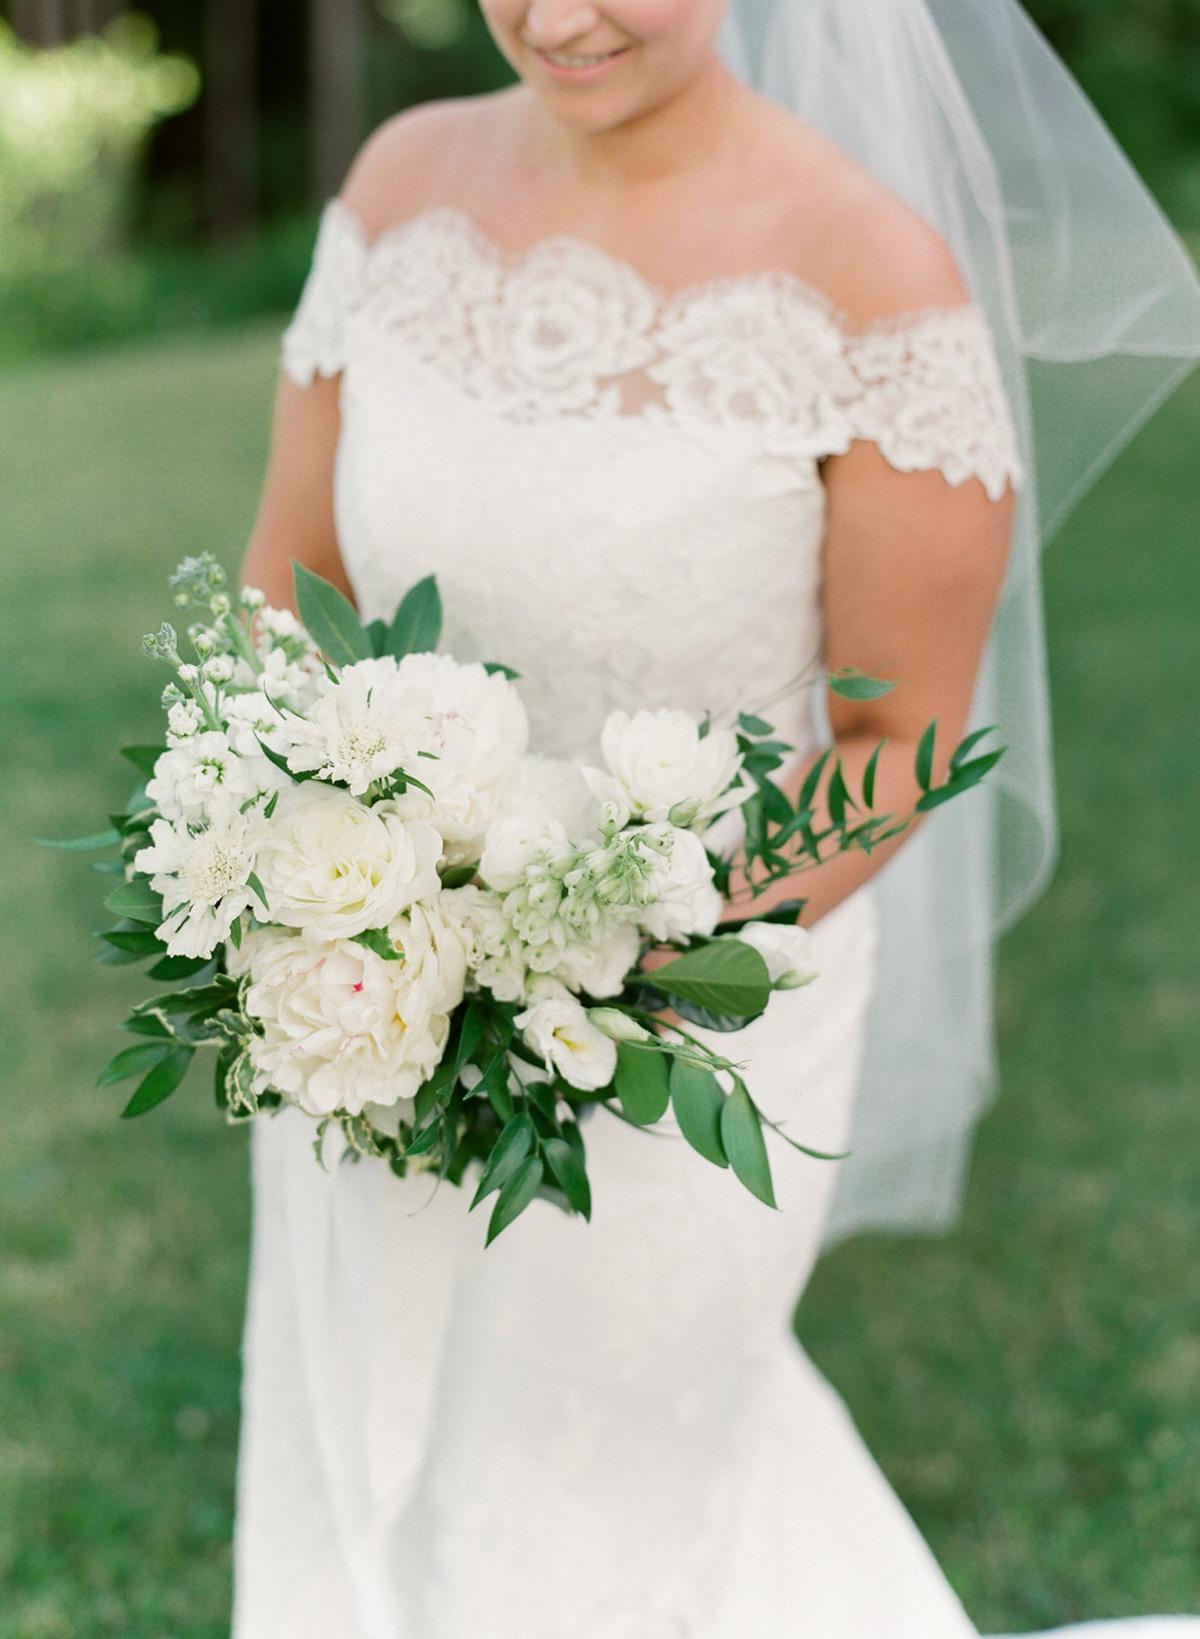 artiese-studios-vineyard-bride-swish-list-private-estate-cambridge-wedding-65.jpg